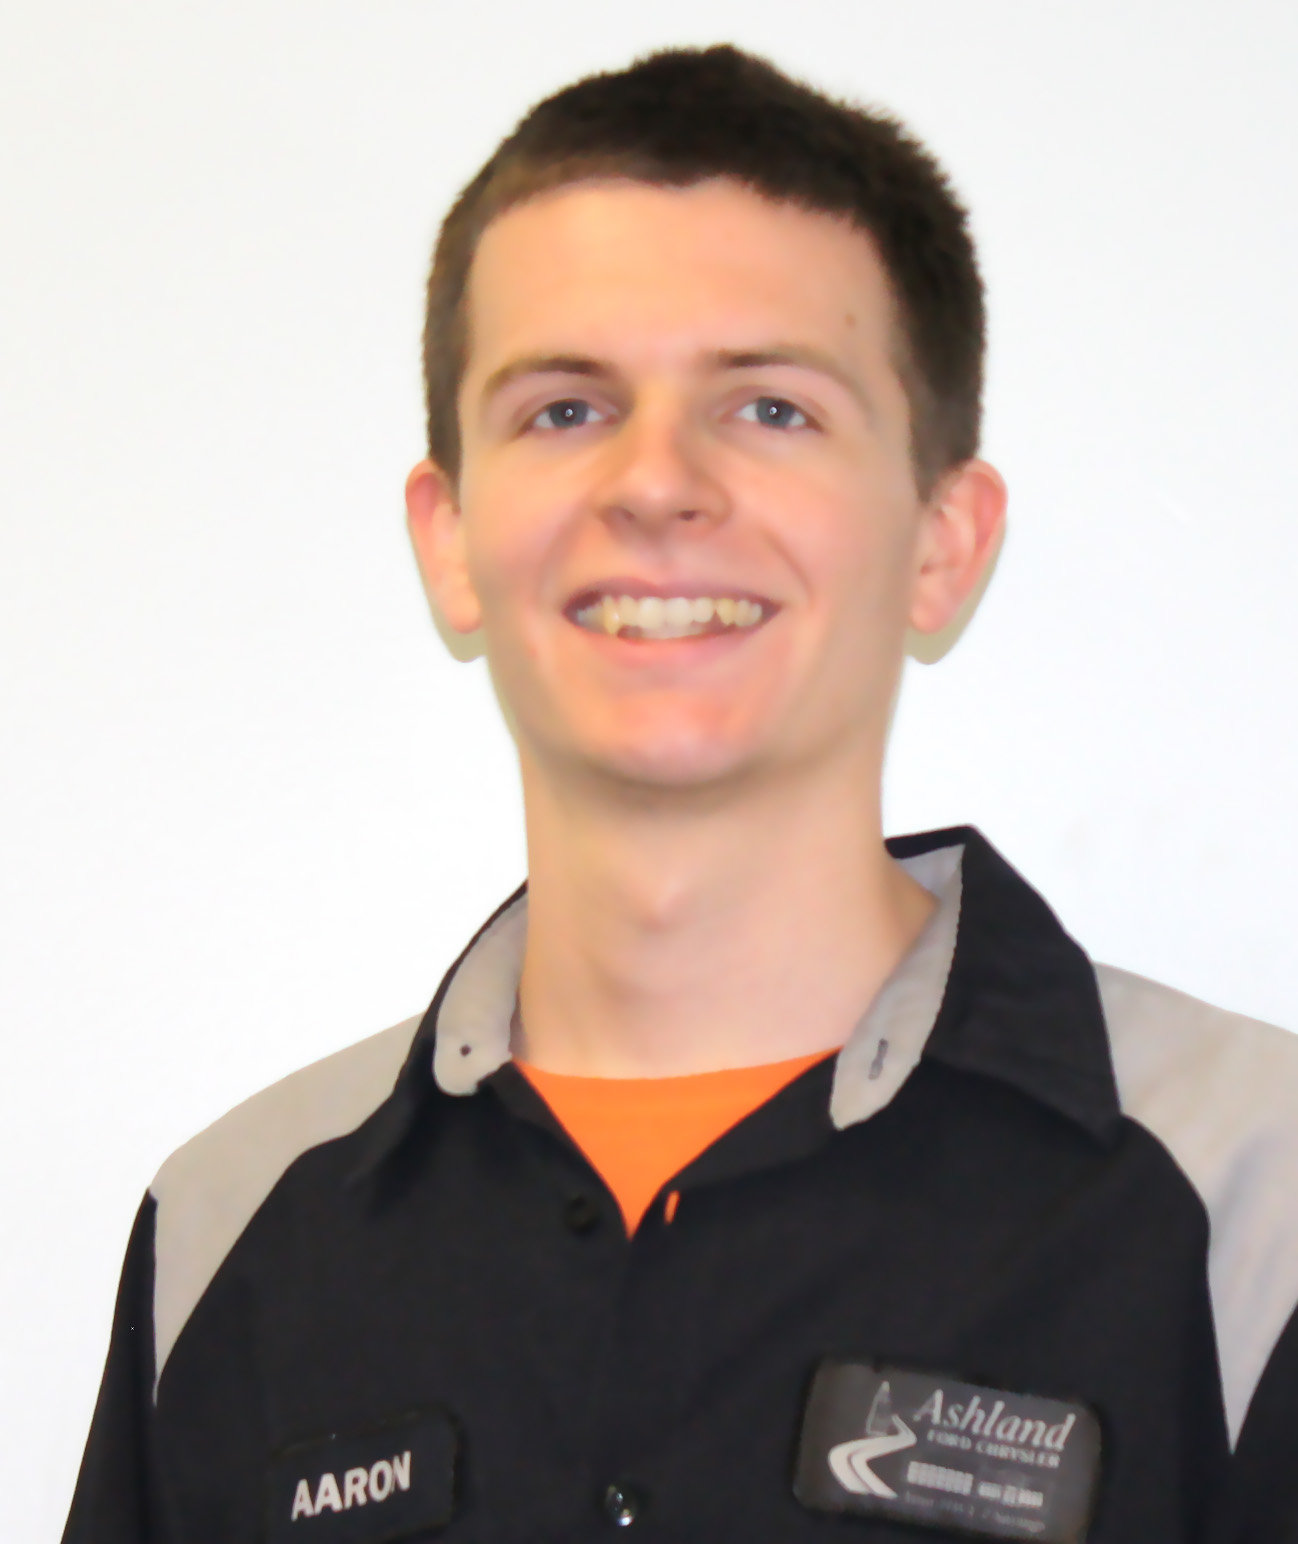 Aaron Tardiff - Body Shop Technician